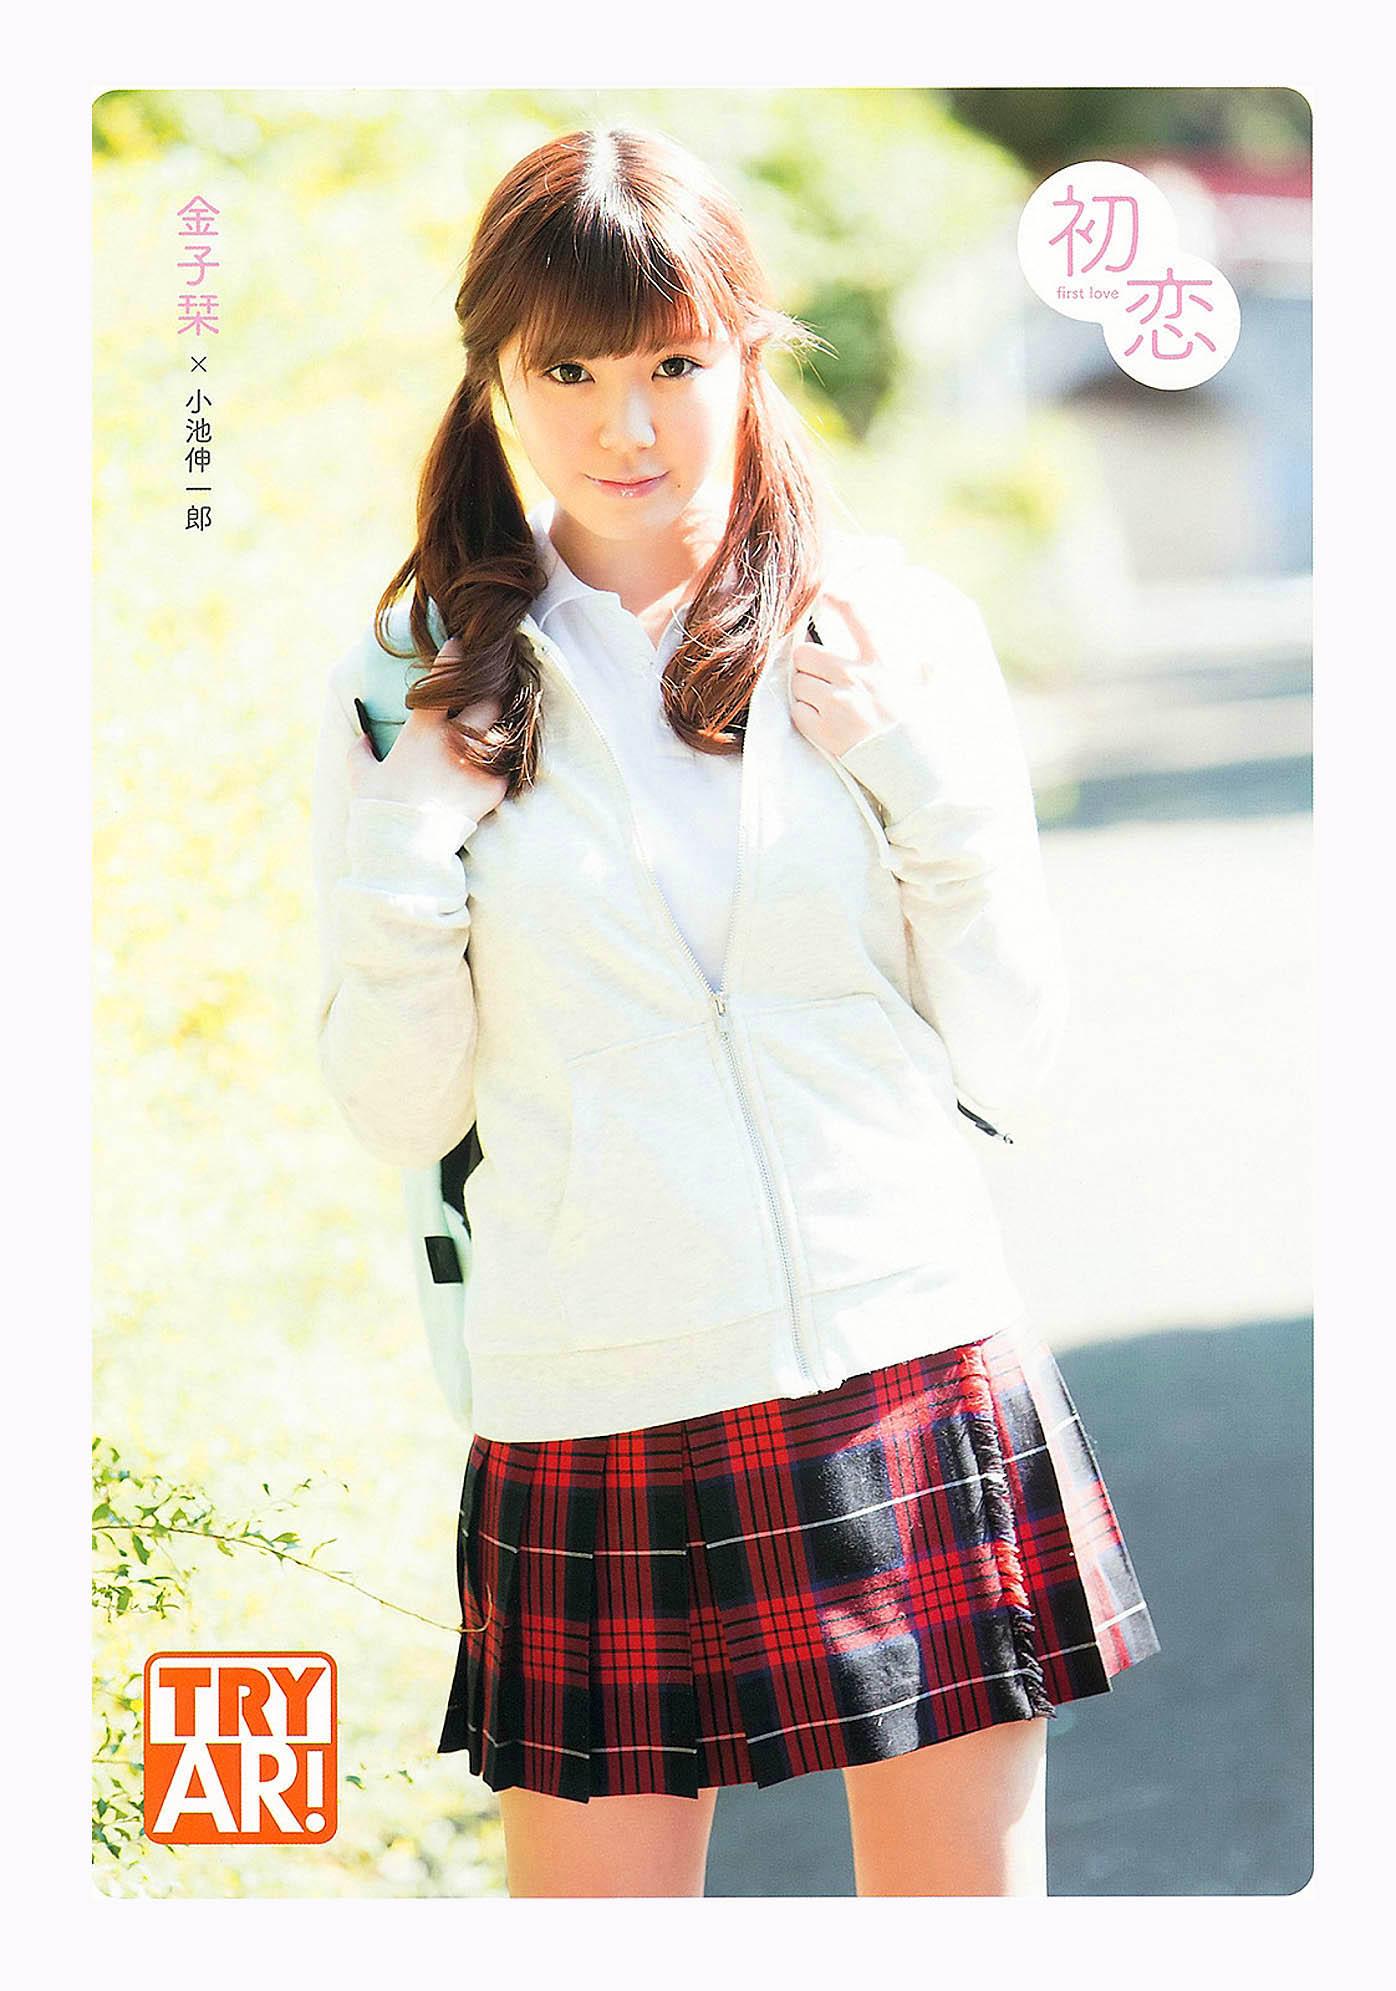 KShiori Young Animal 141212 05.jpg